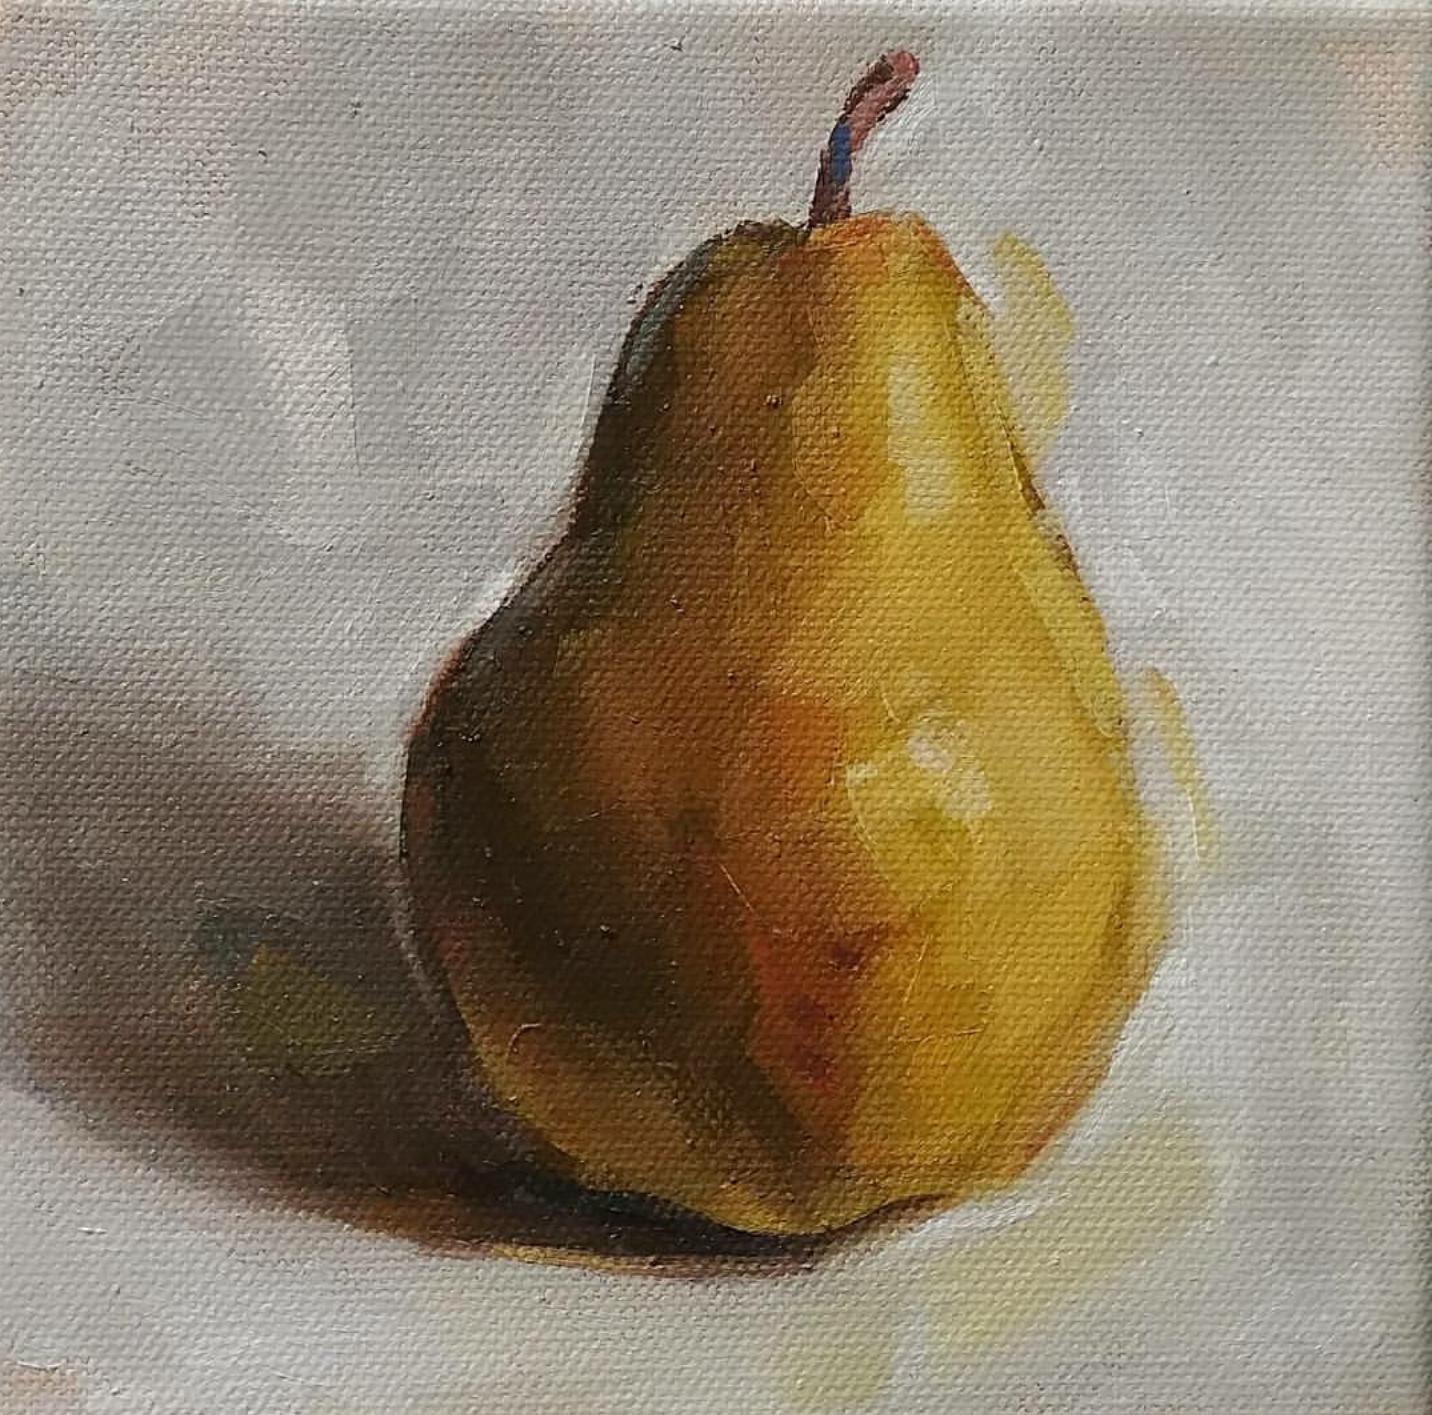 Pear, 6x6